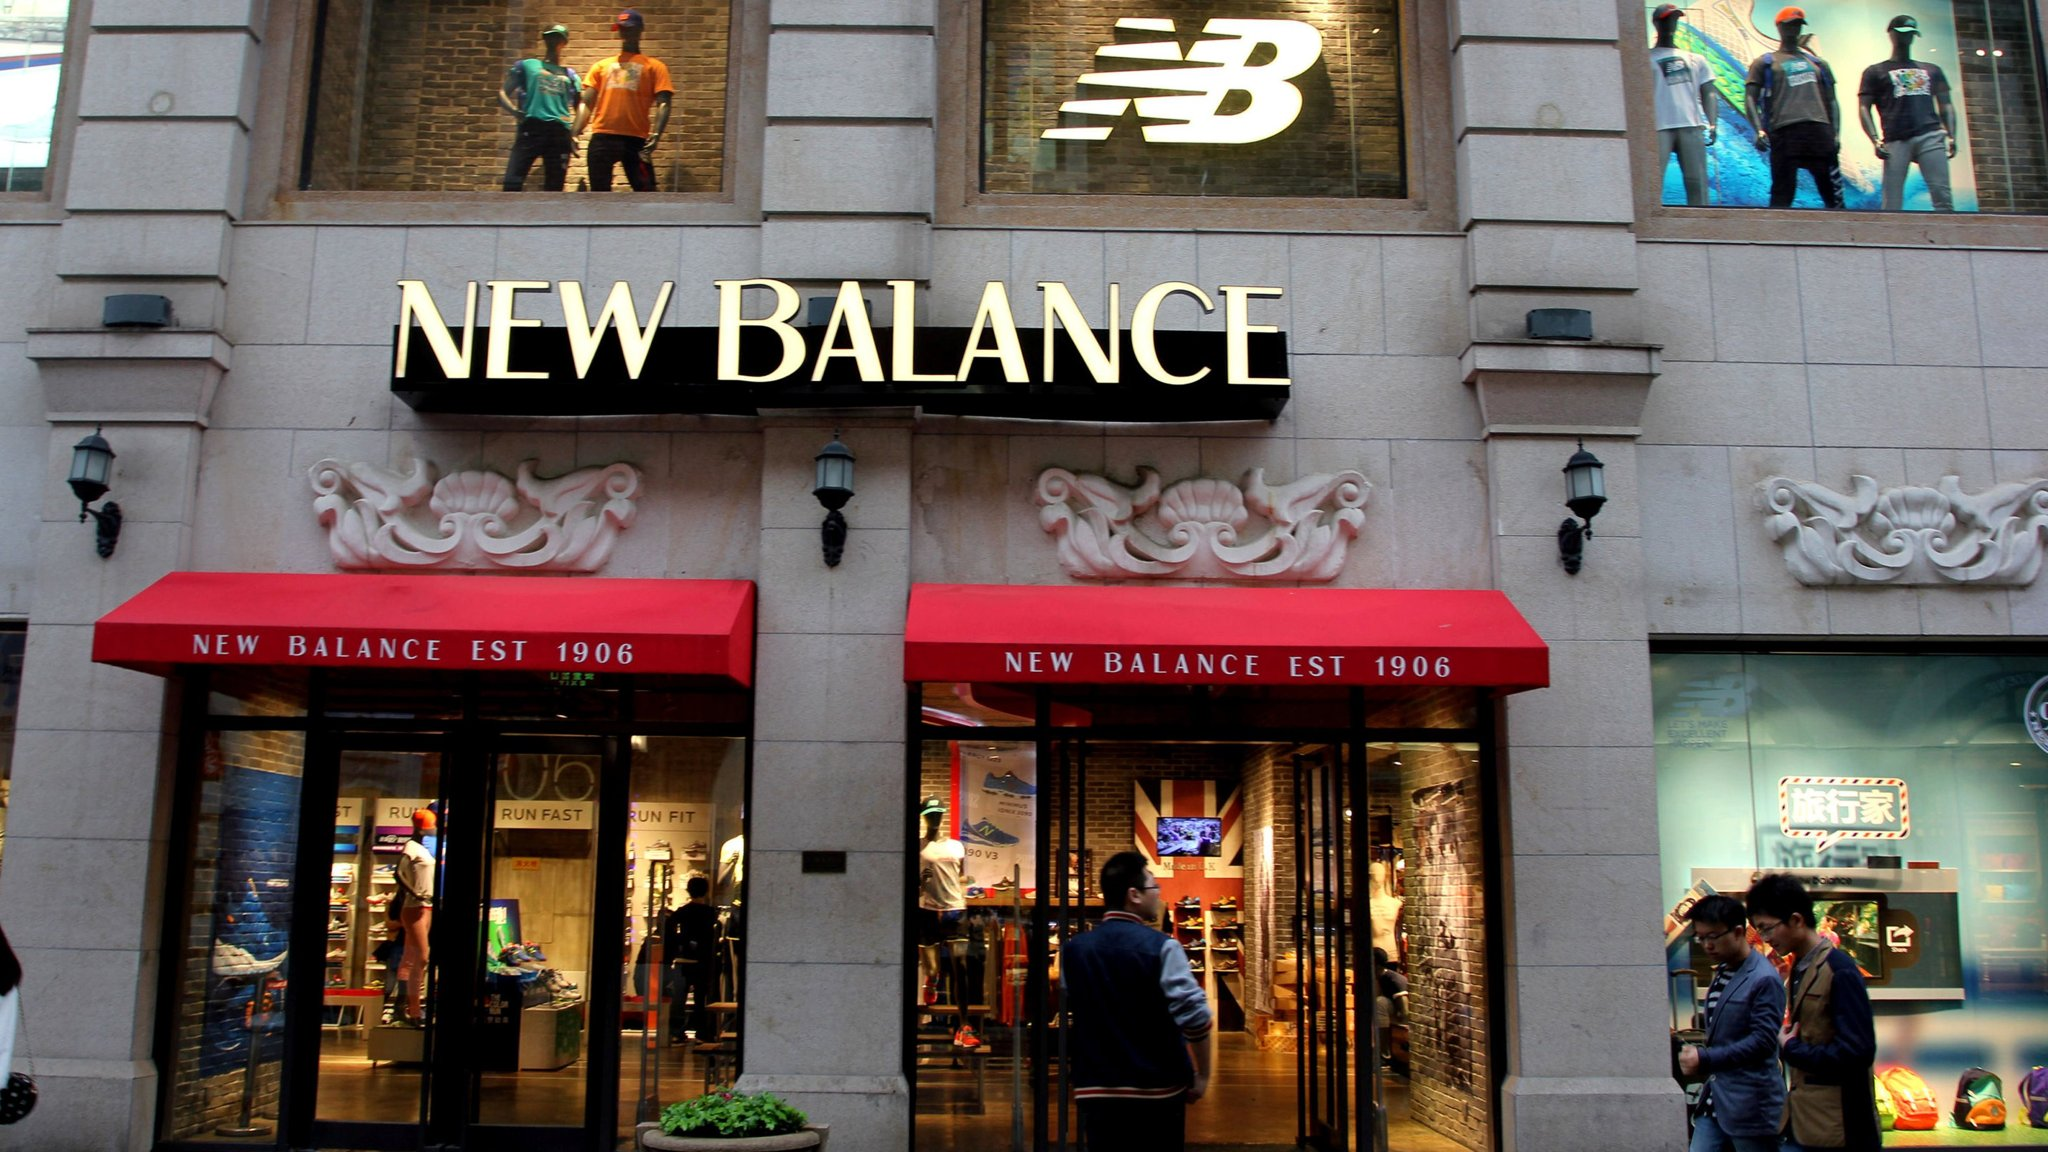 Perímetro Cortar asentamiento  New Balance wins $1.5m damages for China logo infringement | Financial Times